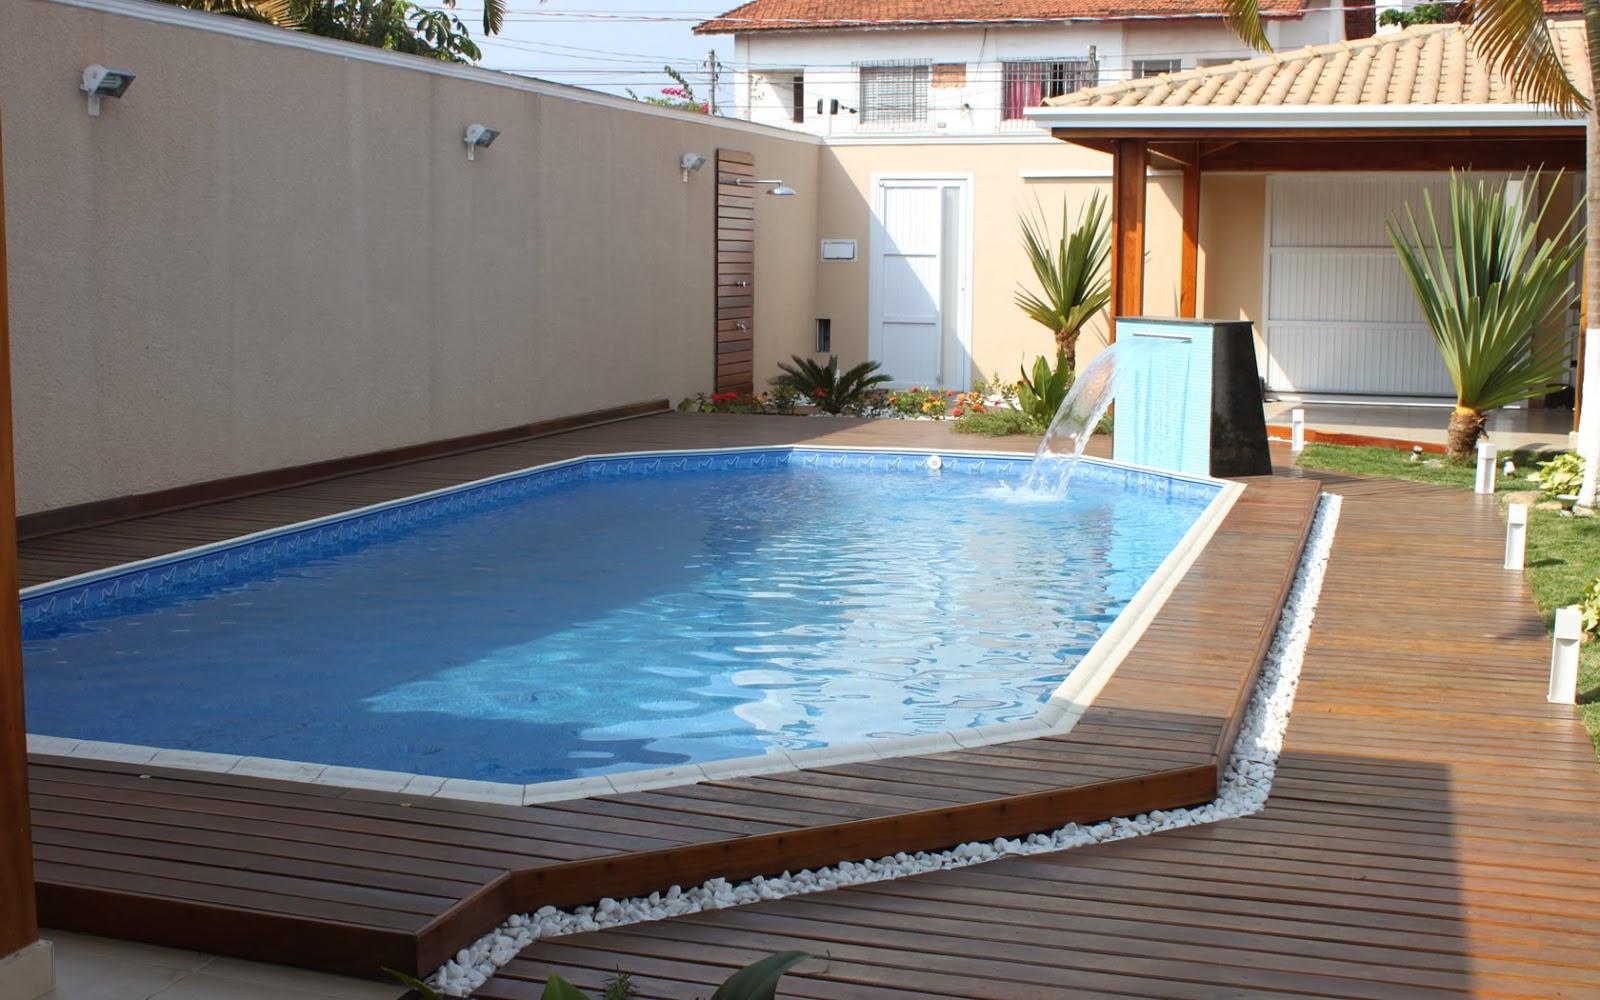 Sonhos secretos 5 sonhos de consumo janeiro for Casas con piscina interior fotos